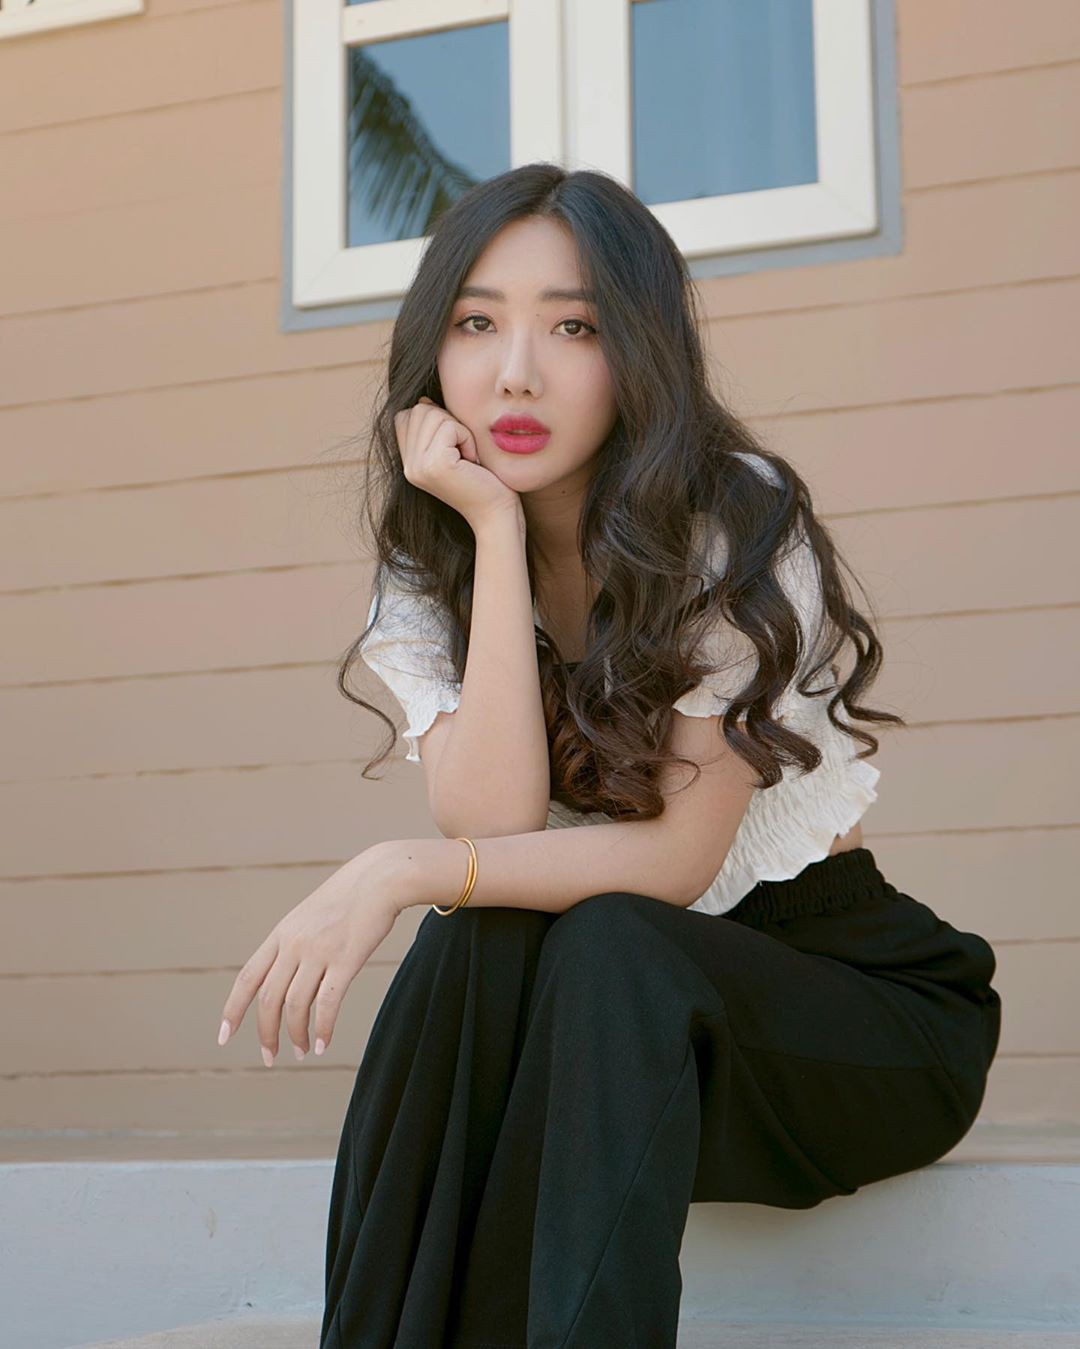 Hsu Eaint San girls photoshoot, Beautiful Lips, Cute Long Hairstyles